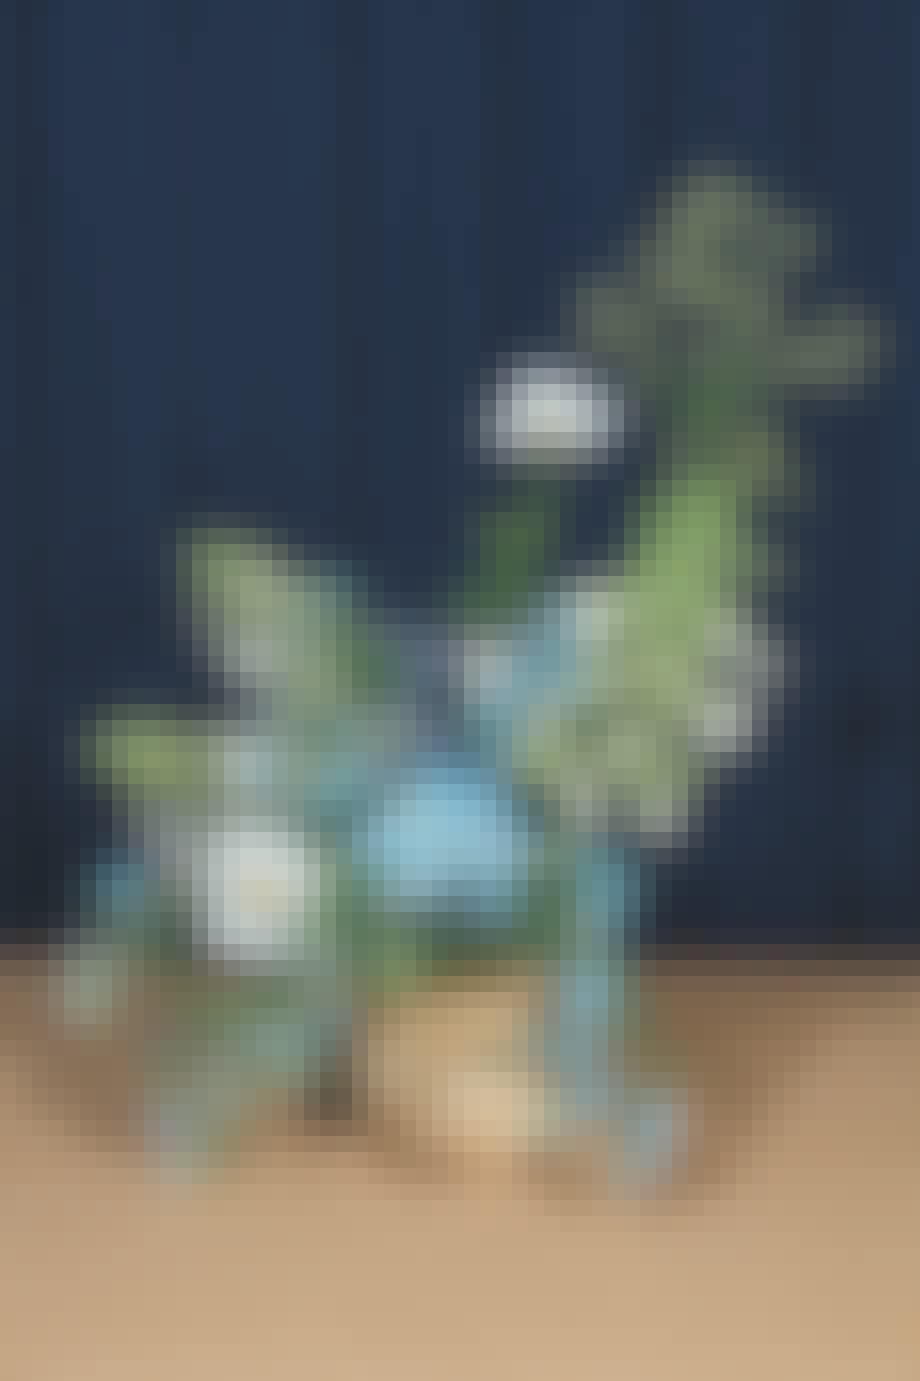 blå buket fra blomst af uffe buchard